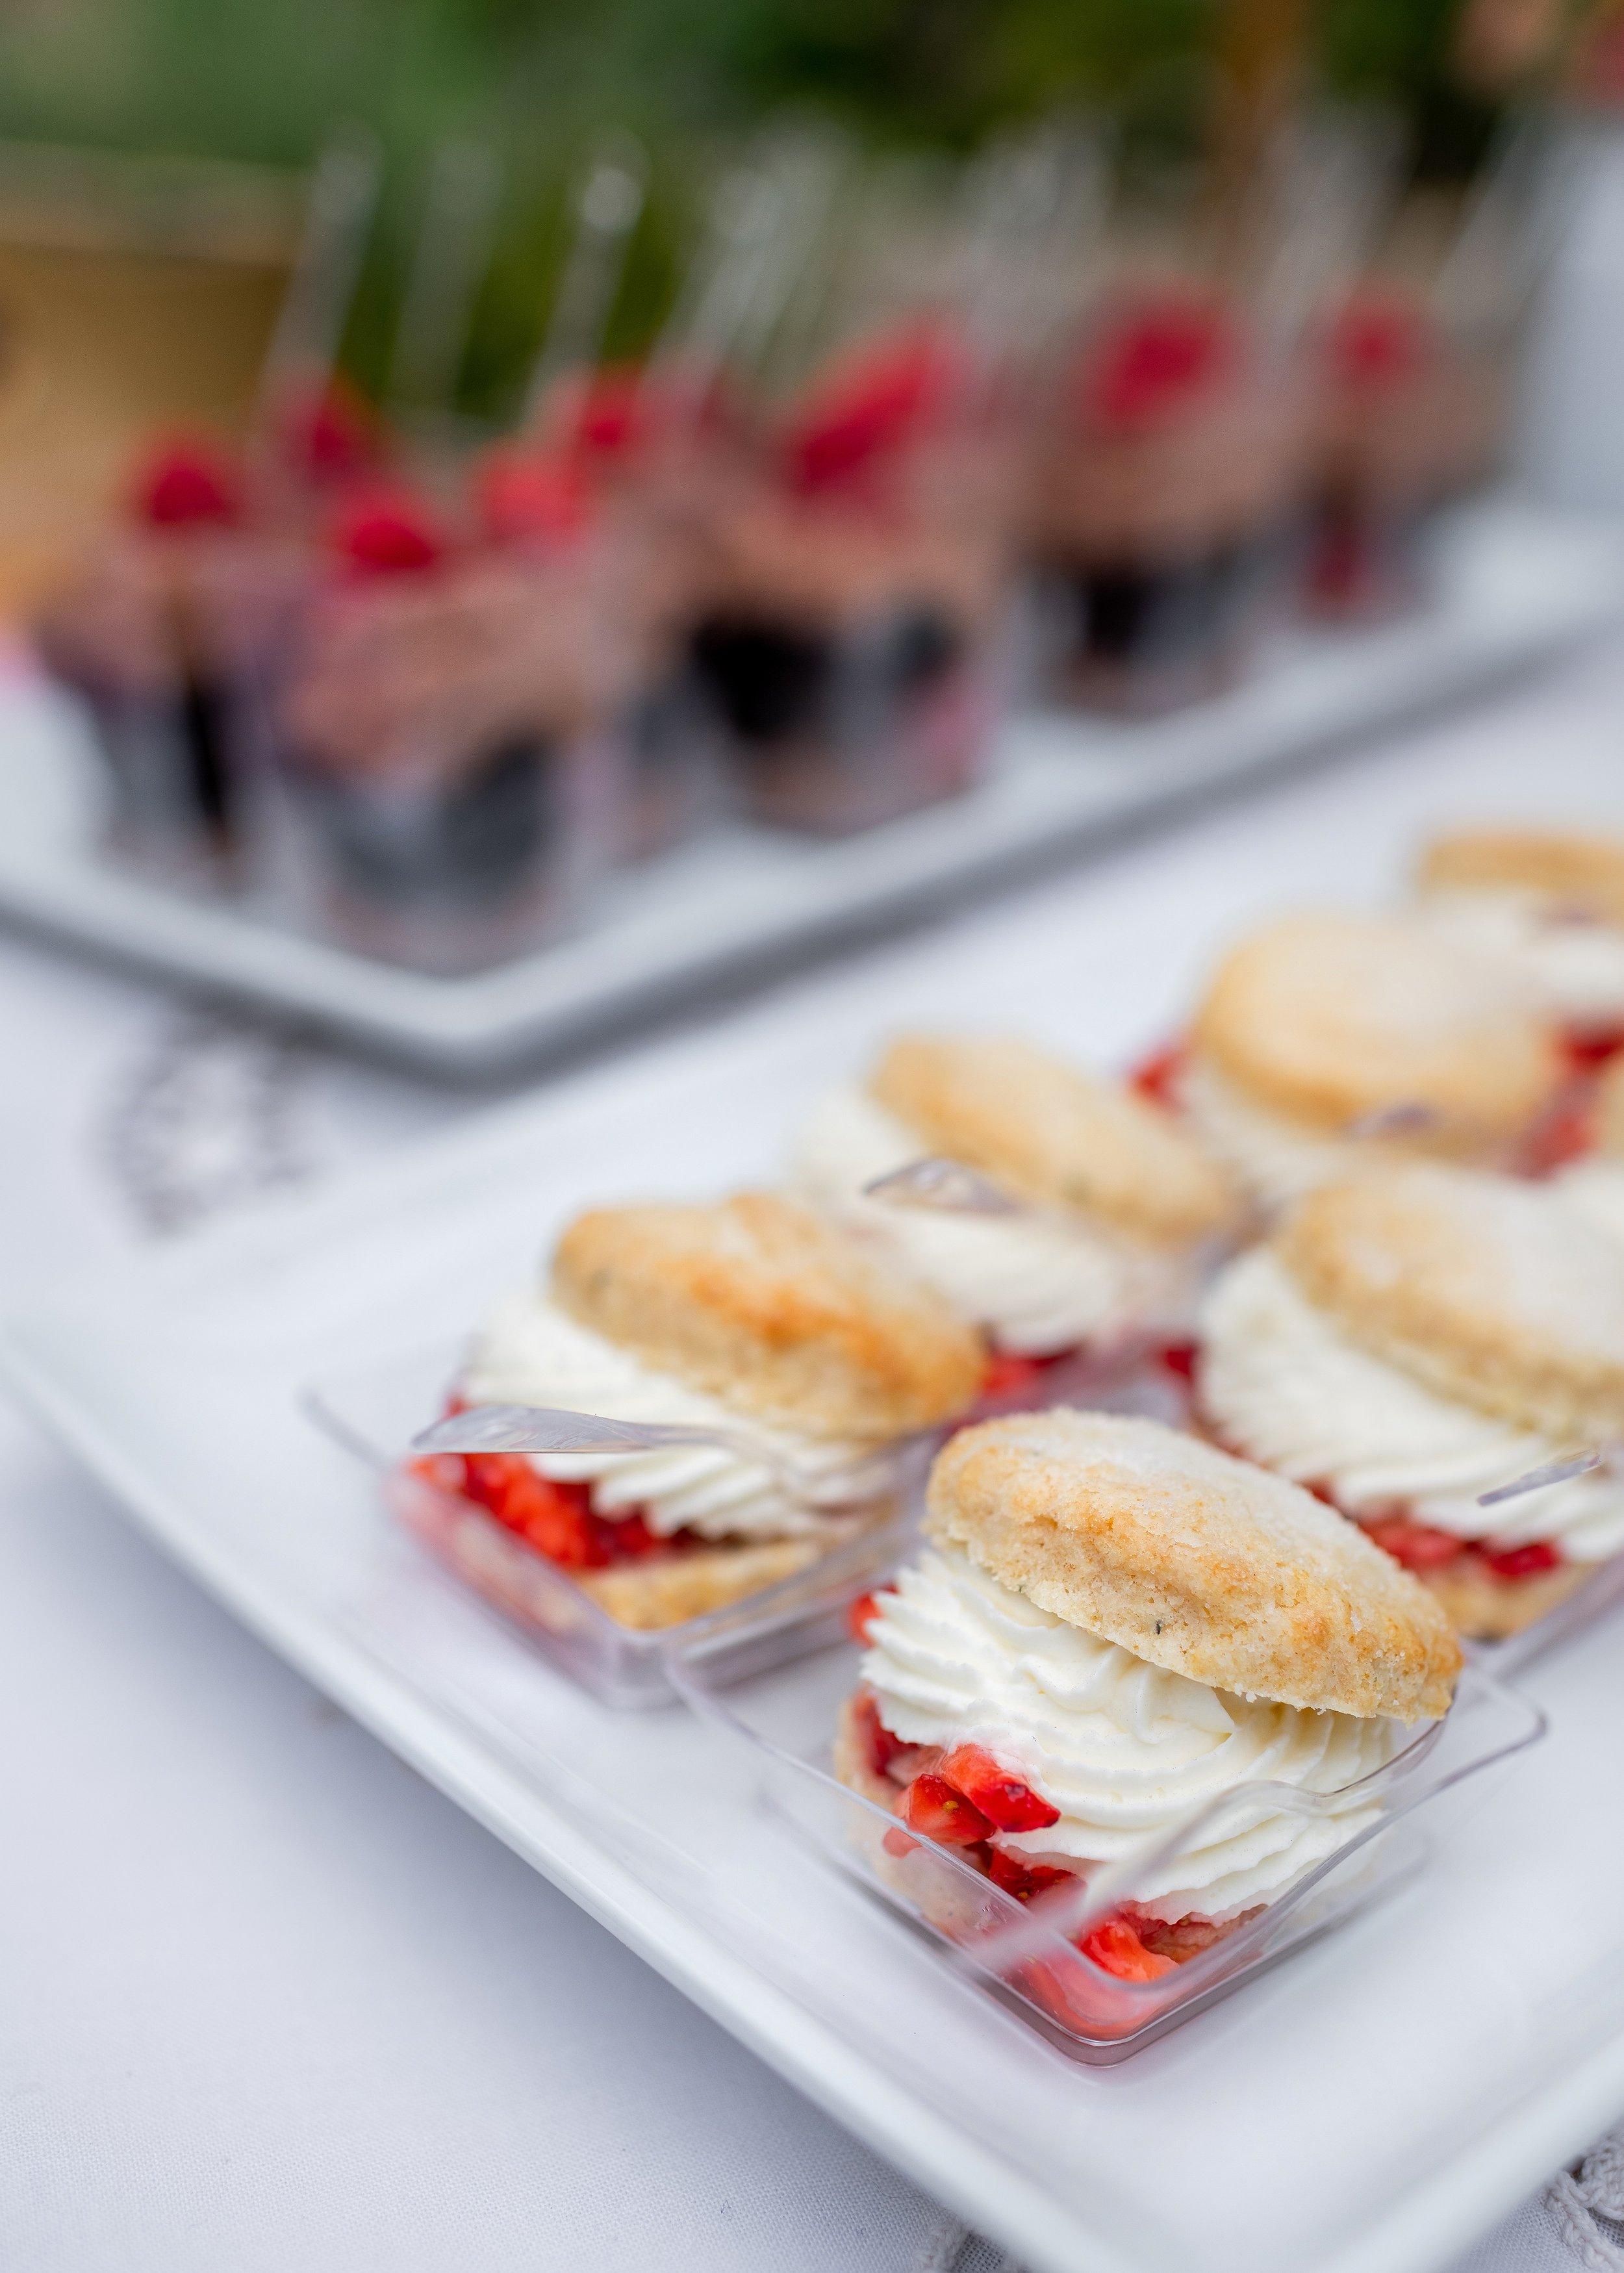 www.santabarbarawedding.com | Willa Kveta Photography | Santa Barbara Classic Weddings | Officiant Event | Dessert